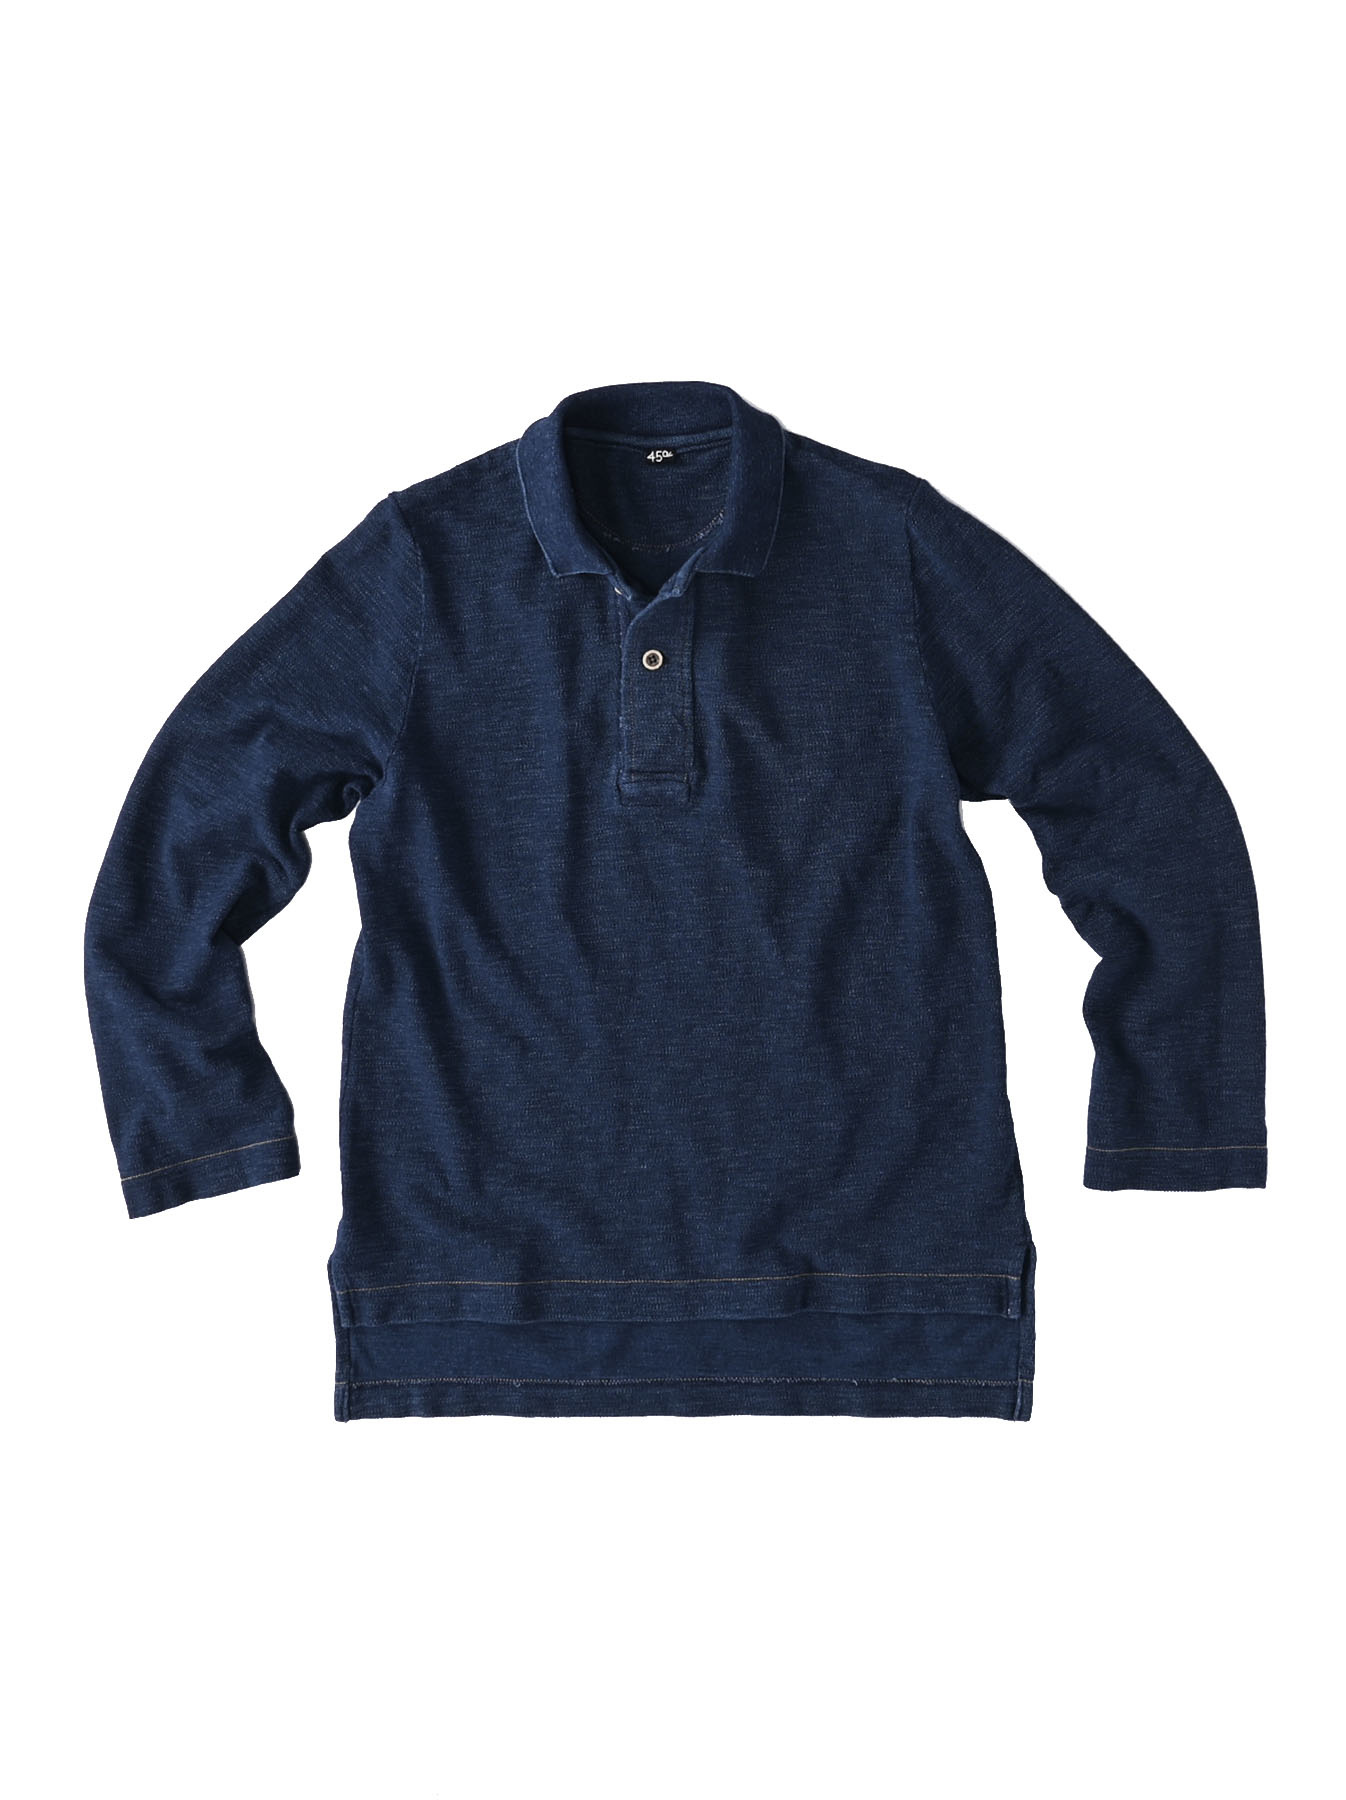 Indigo Kanoko Shiokaze Long-sleeved Square Polo Shirt (0521)-1